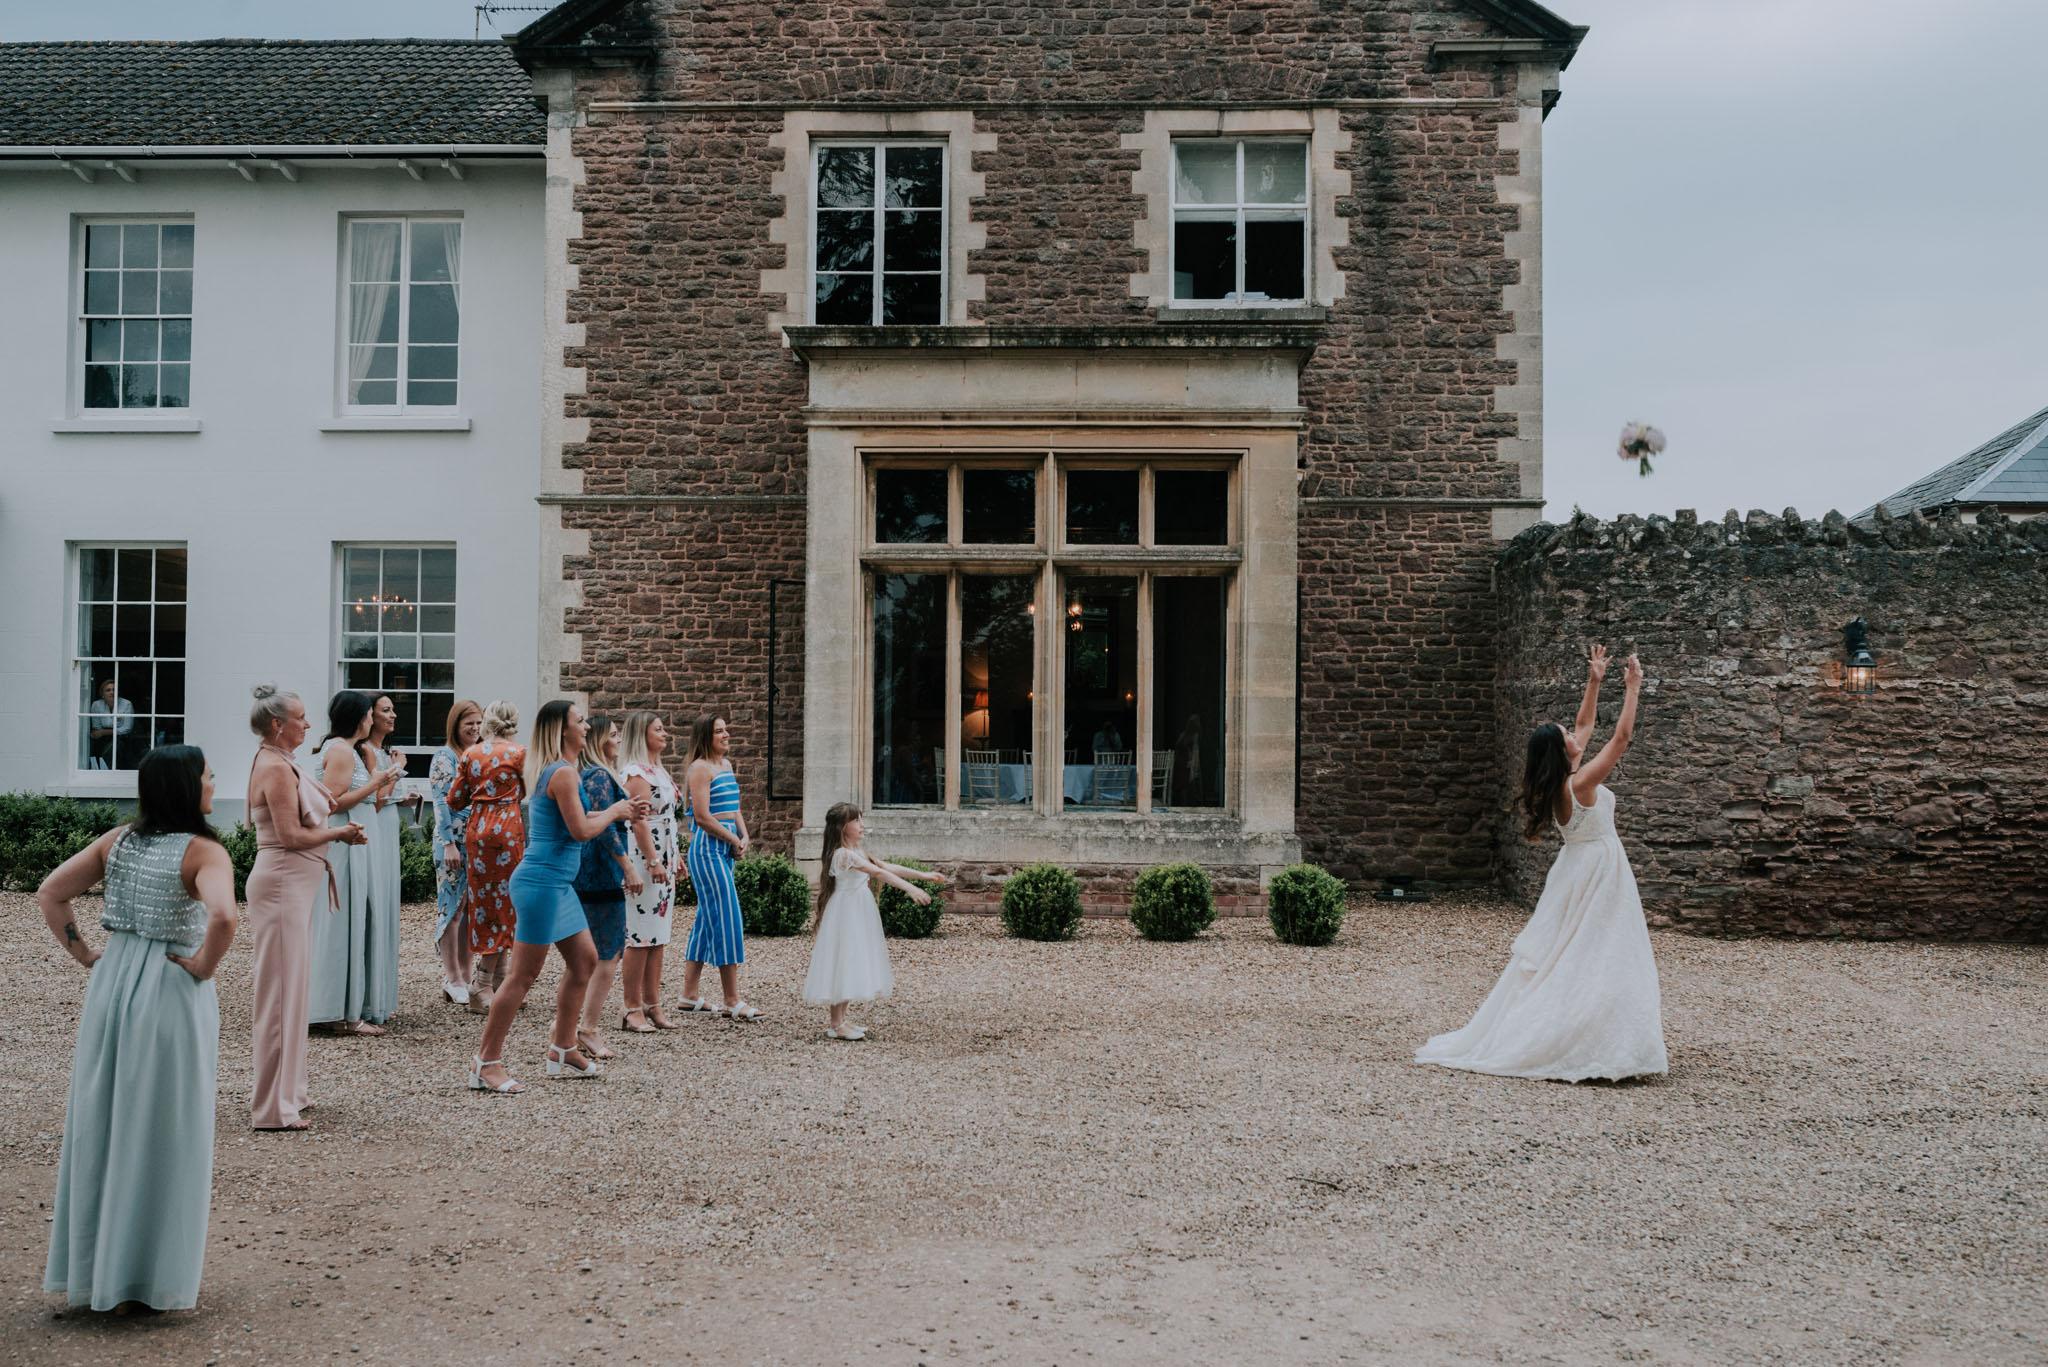 wedding-photographer-glewstone-court-hereford-scott-stockwell-photography464.jpg